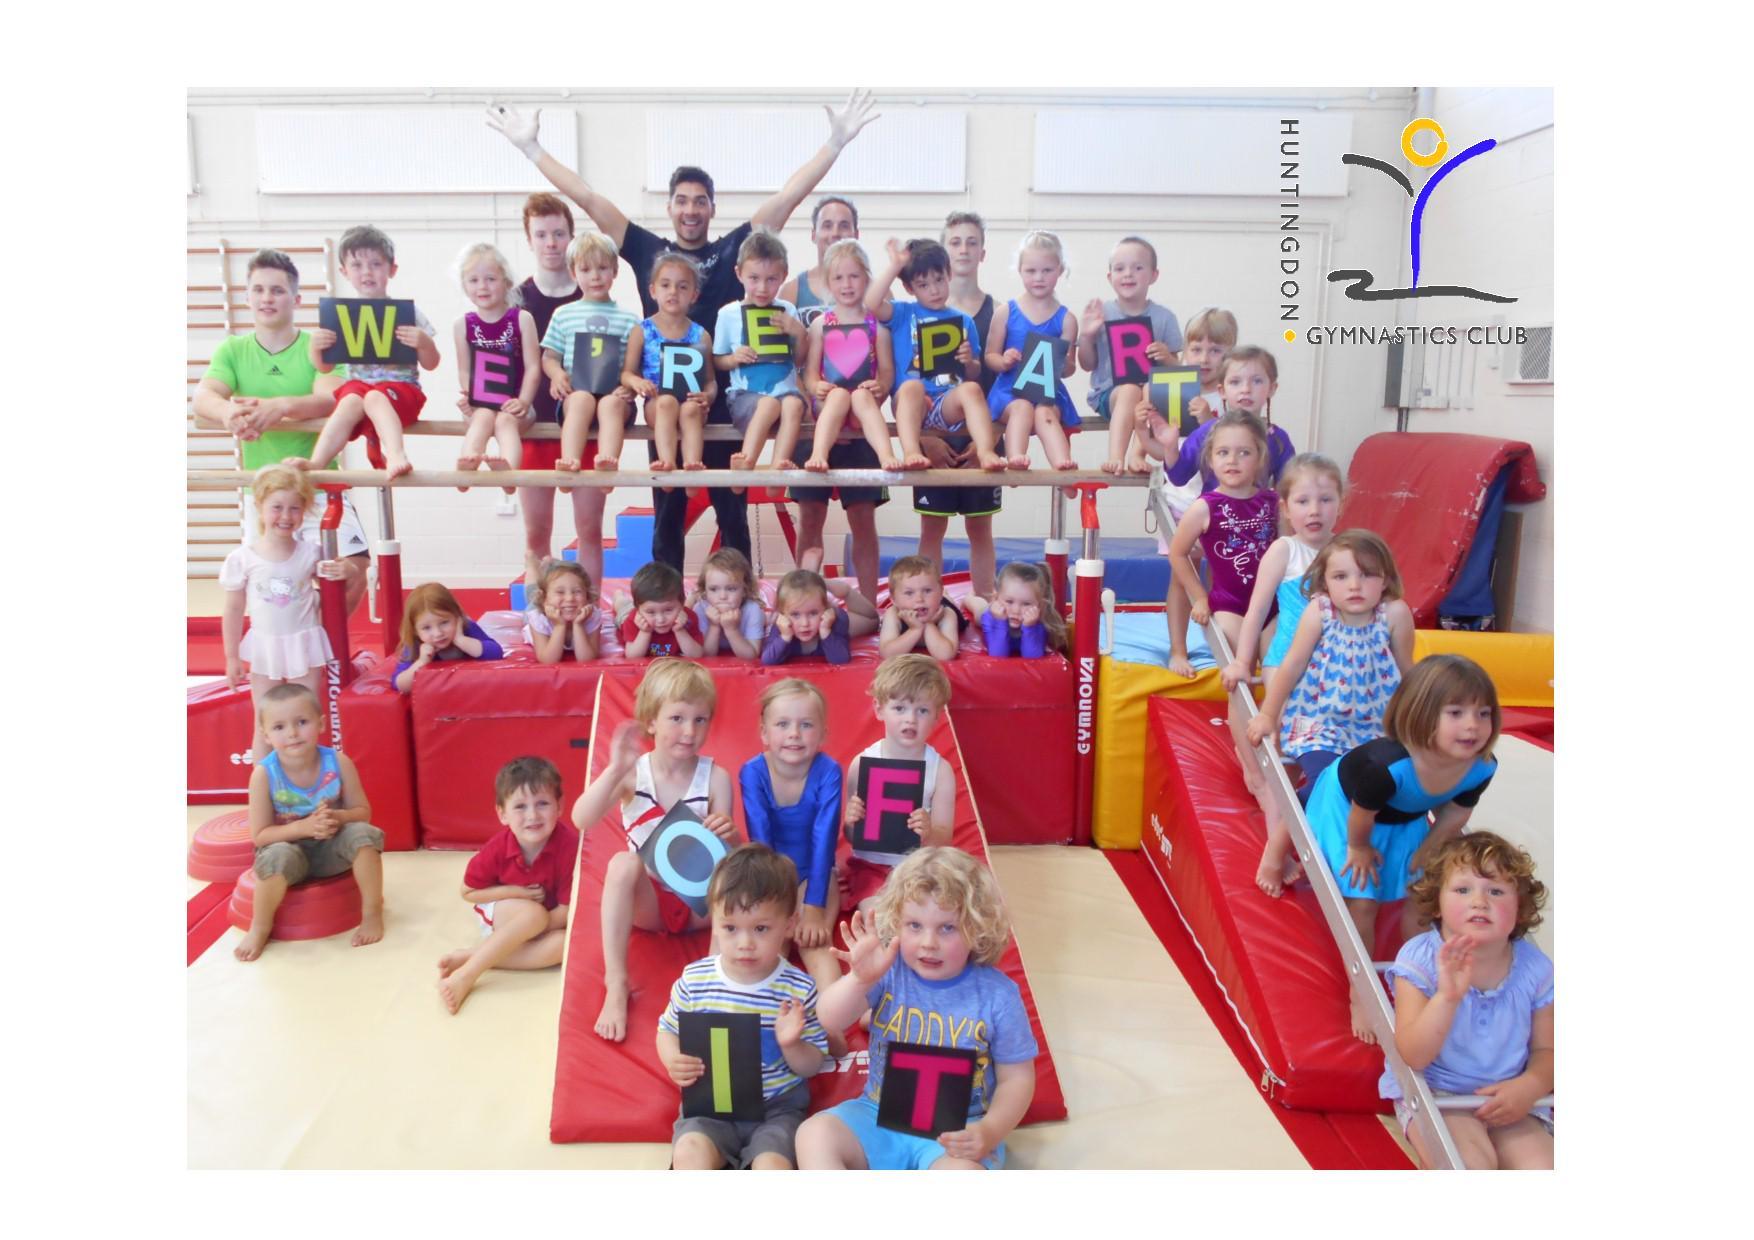 RT @HuntsGymClub: Louis Smith, Dan Keatings and the boys plus preschool All Part of It #BePartOfIt2015WGC http://t.co/09tsvQmb3y